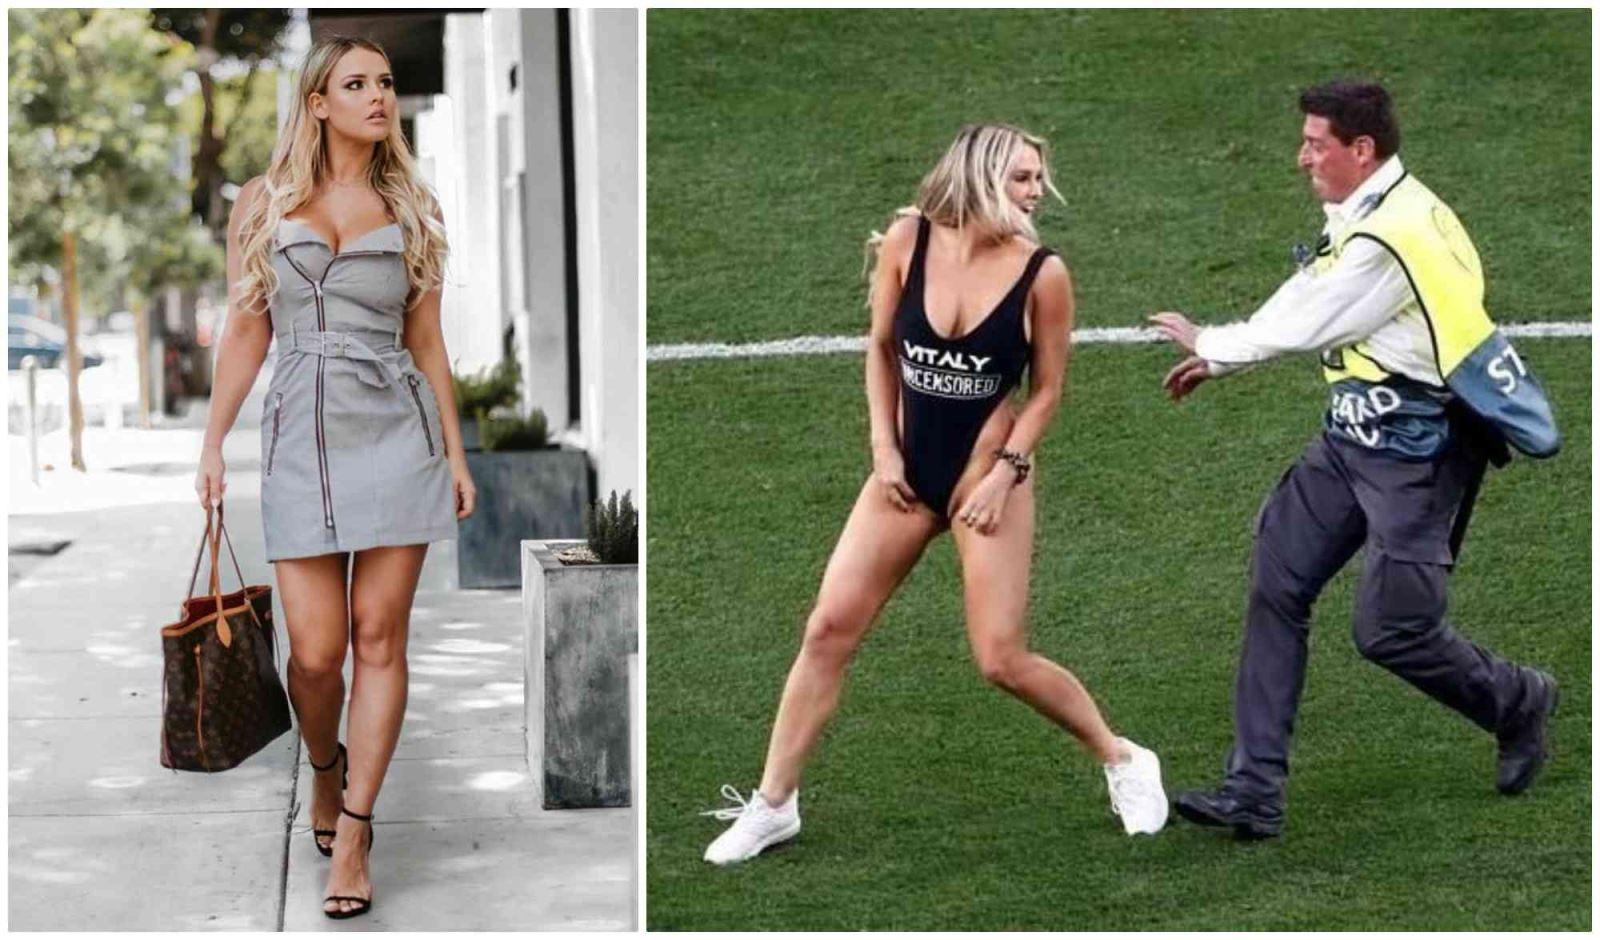 Kinsey Wolanski, người đẹp, ngực khủng, liverpool, tottenham, liverpool vs tottenham, Champions League, Chung kết Champions League, scandal